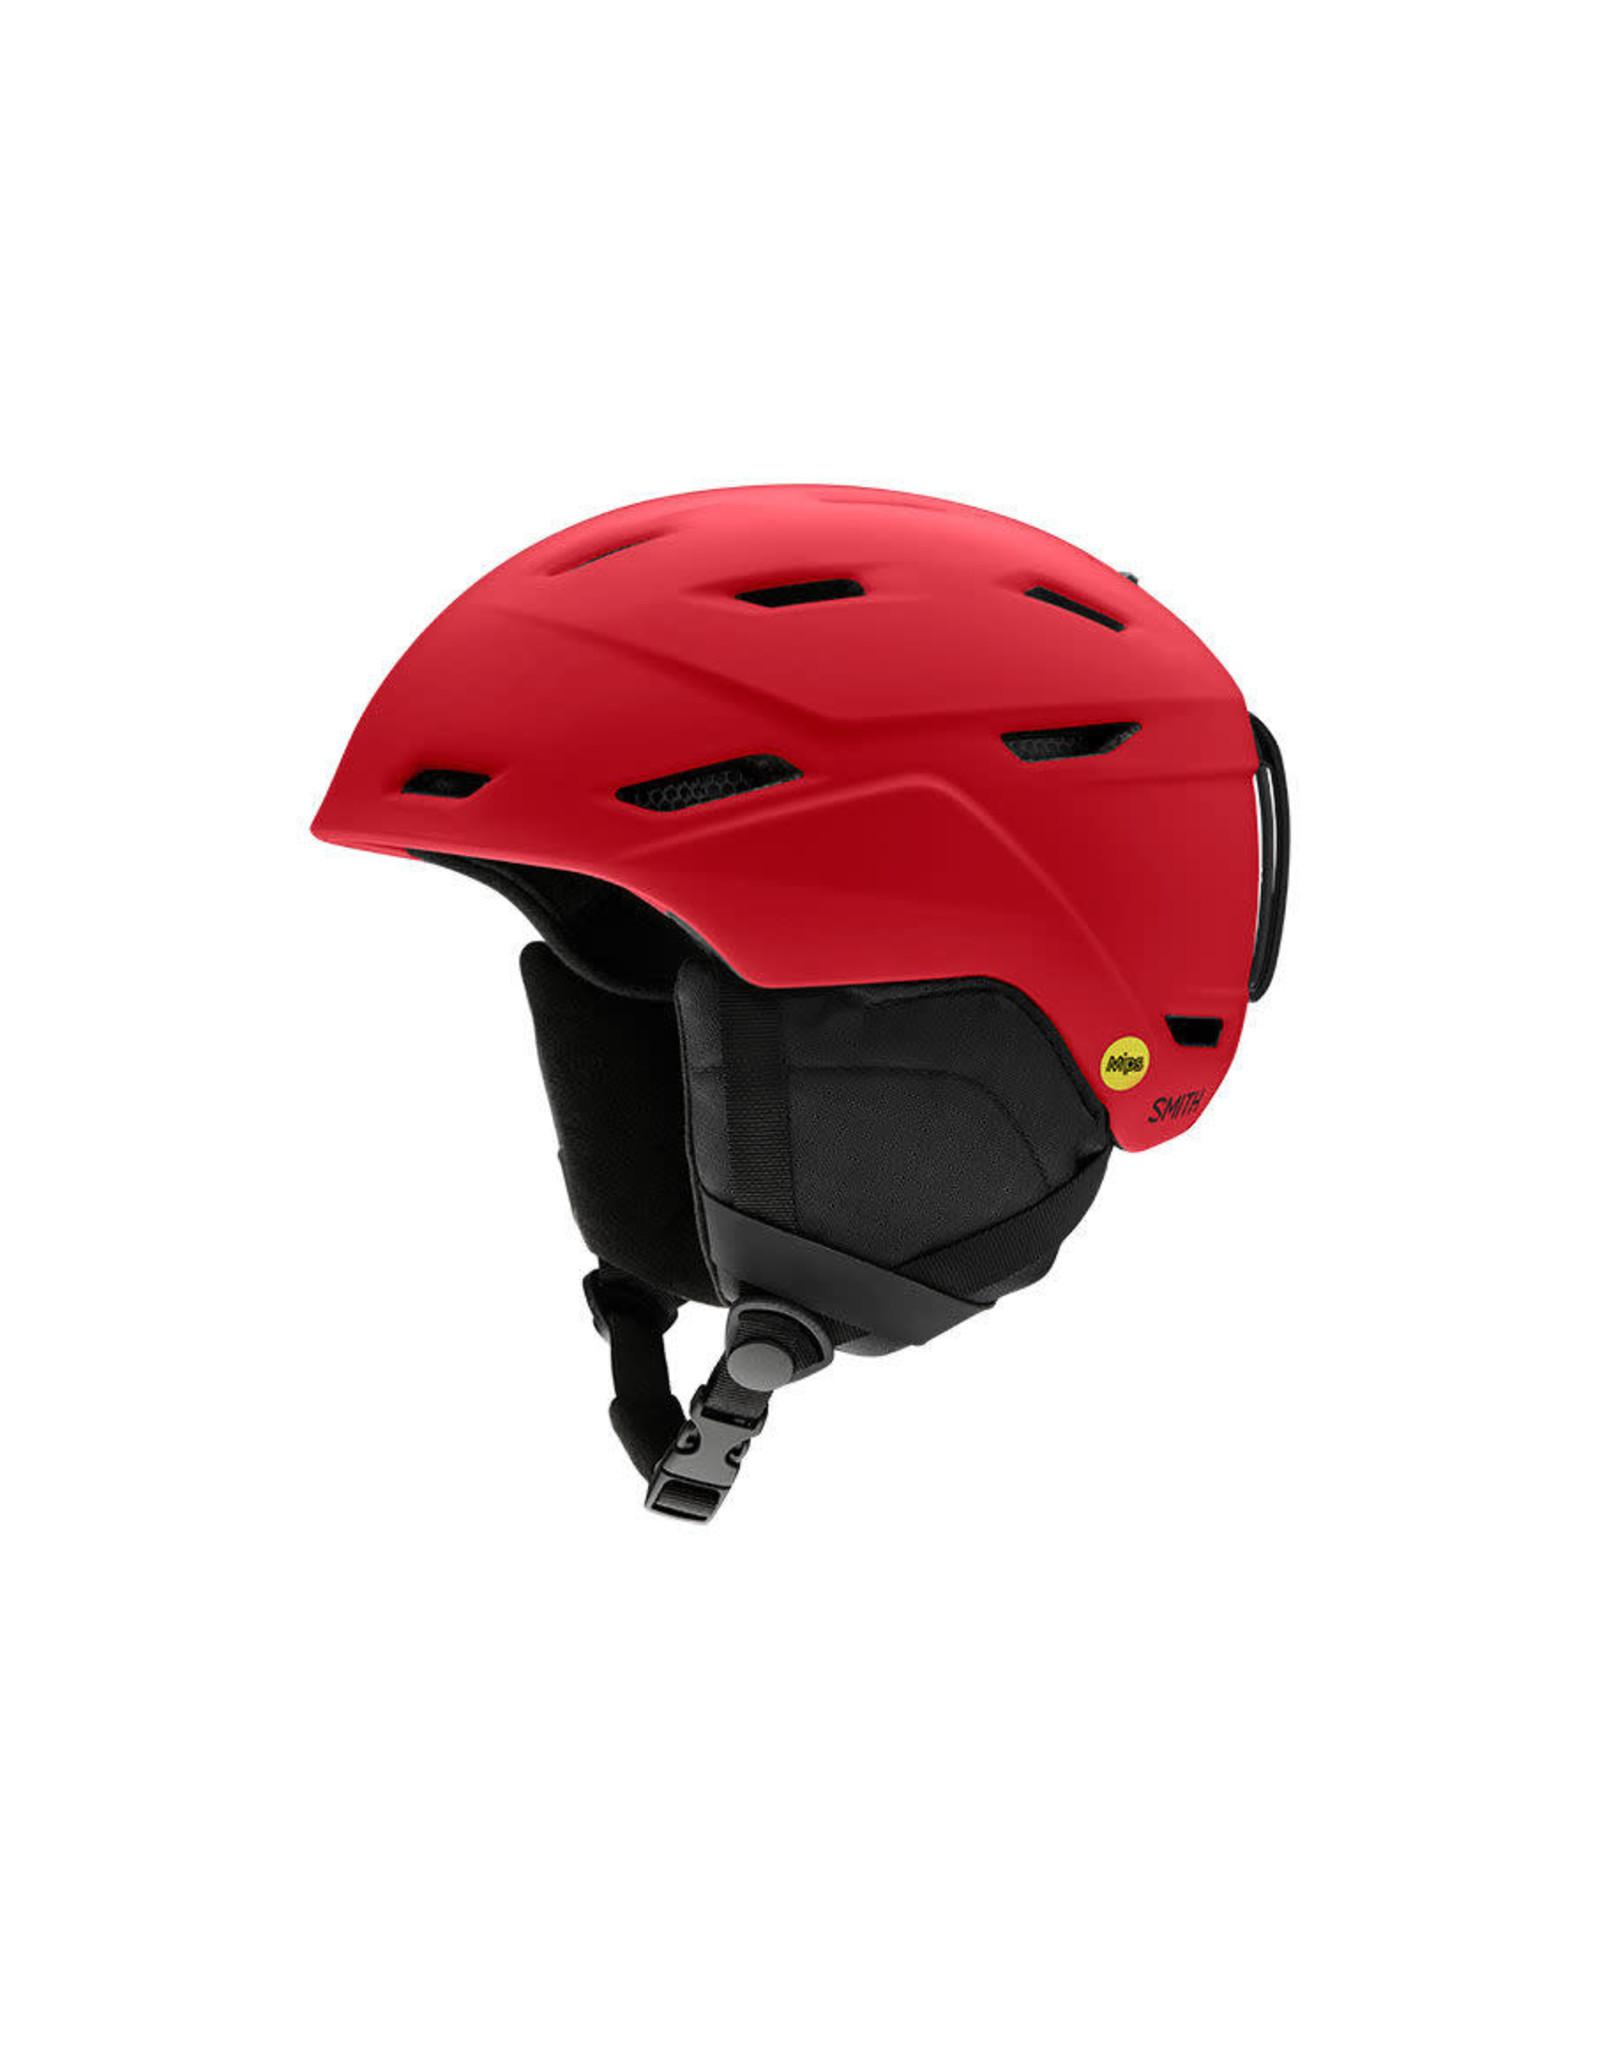 smith optics Smith Mission mips helmet - Matte lava - X Large 63-67 cm